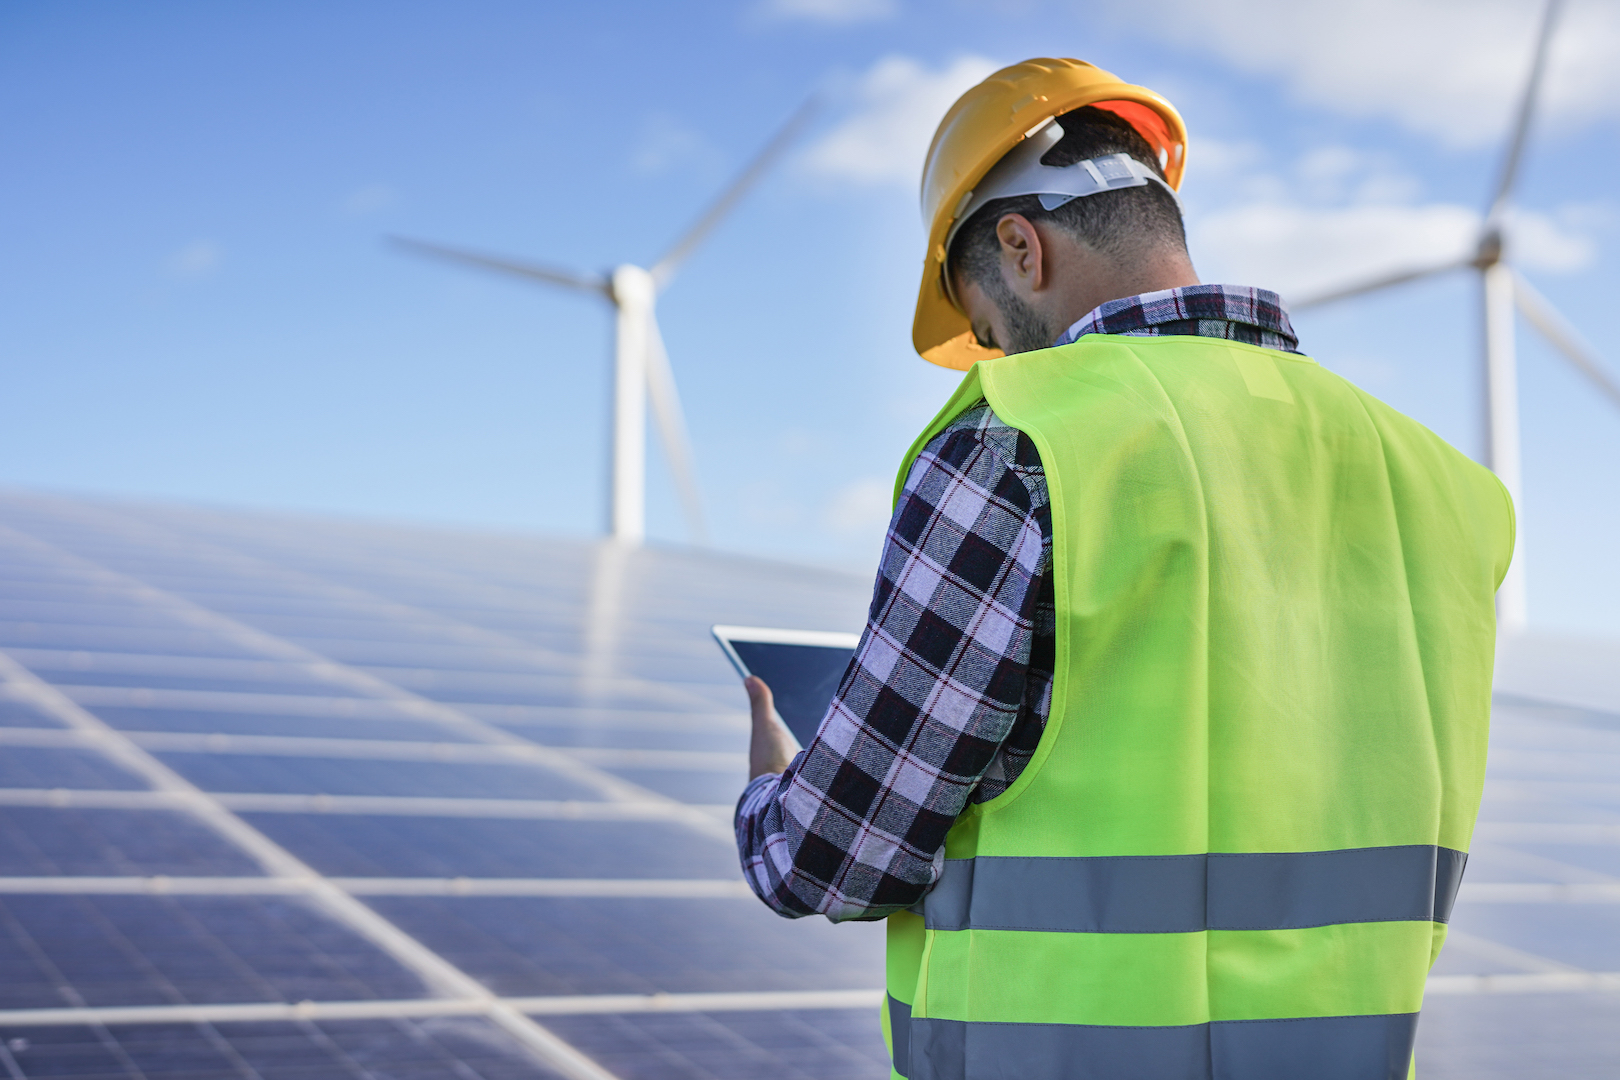 Masdar to support Uzbekistan's clean energy goals